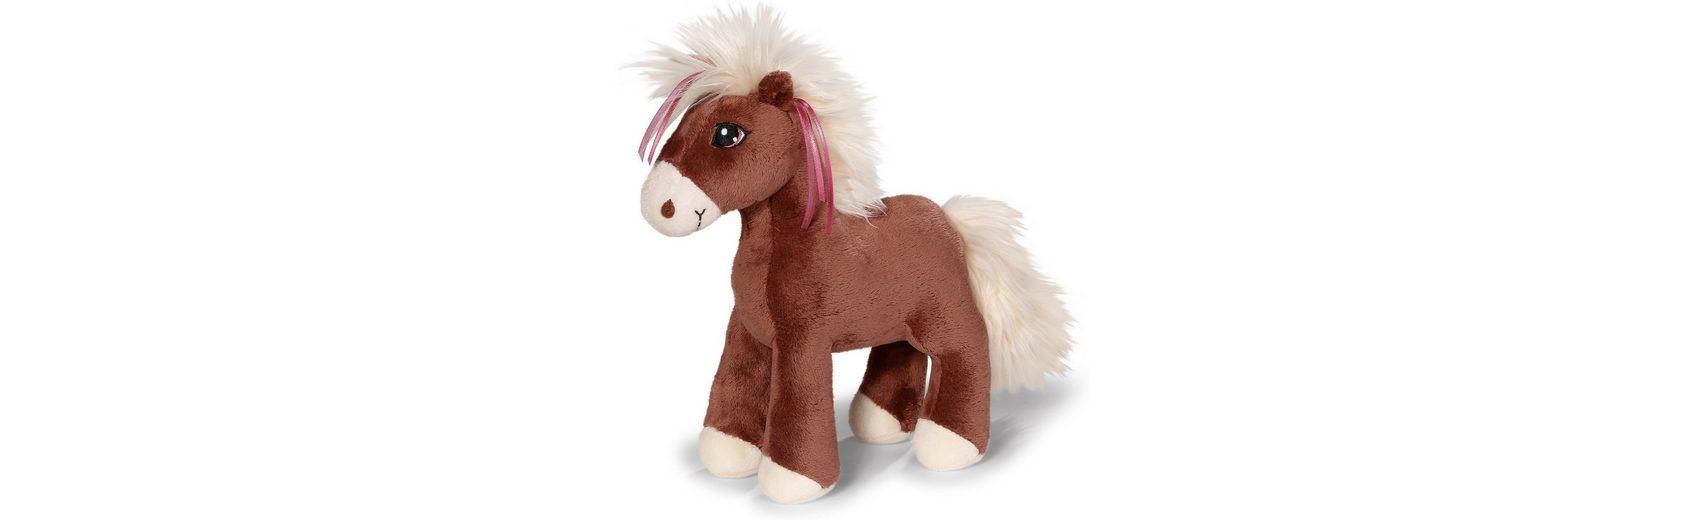 NICI Pferd Velvet stehend 25cm (37848)